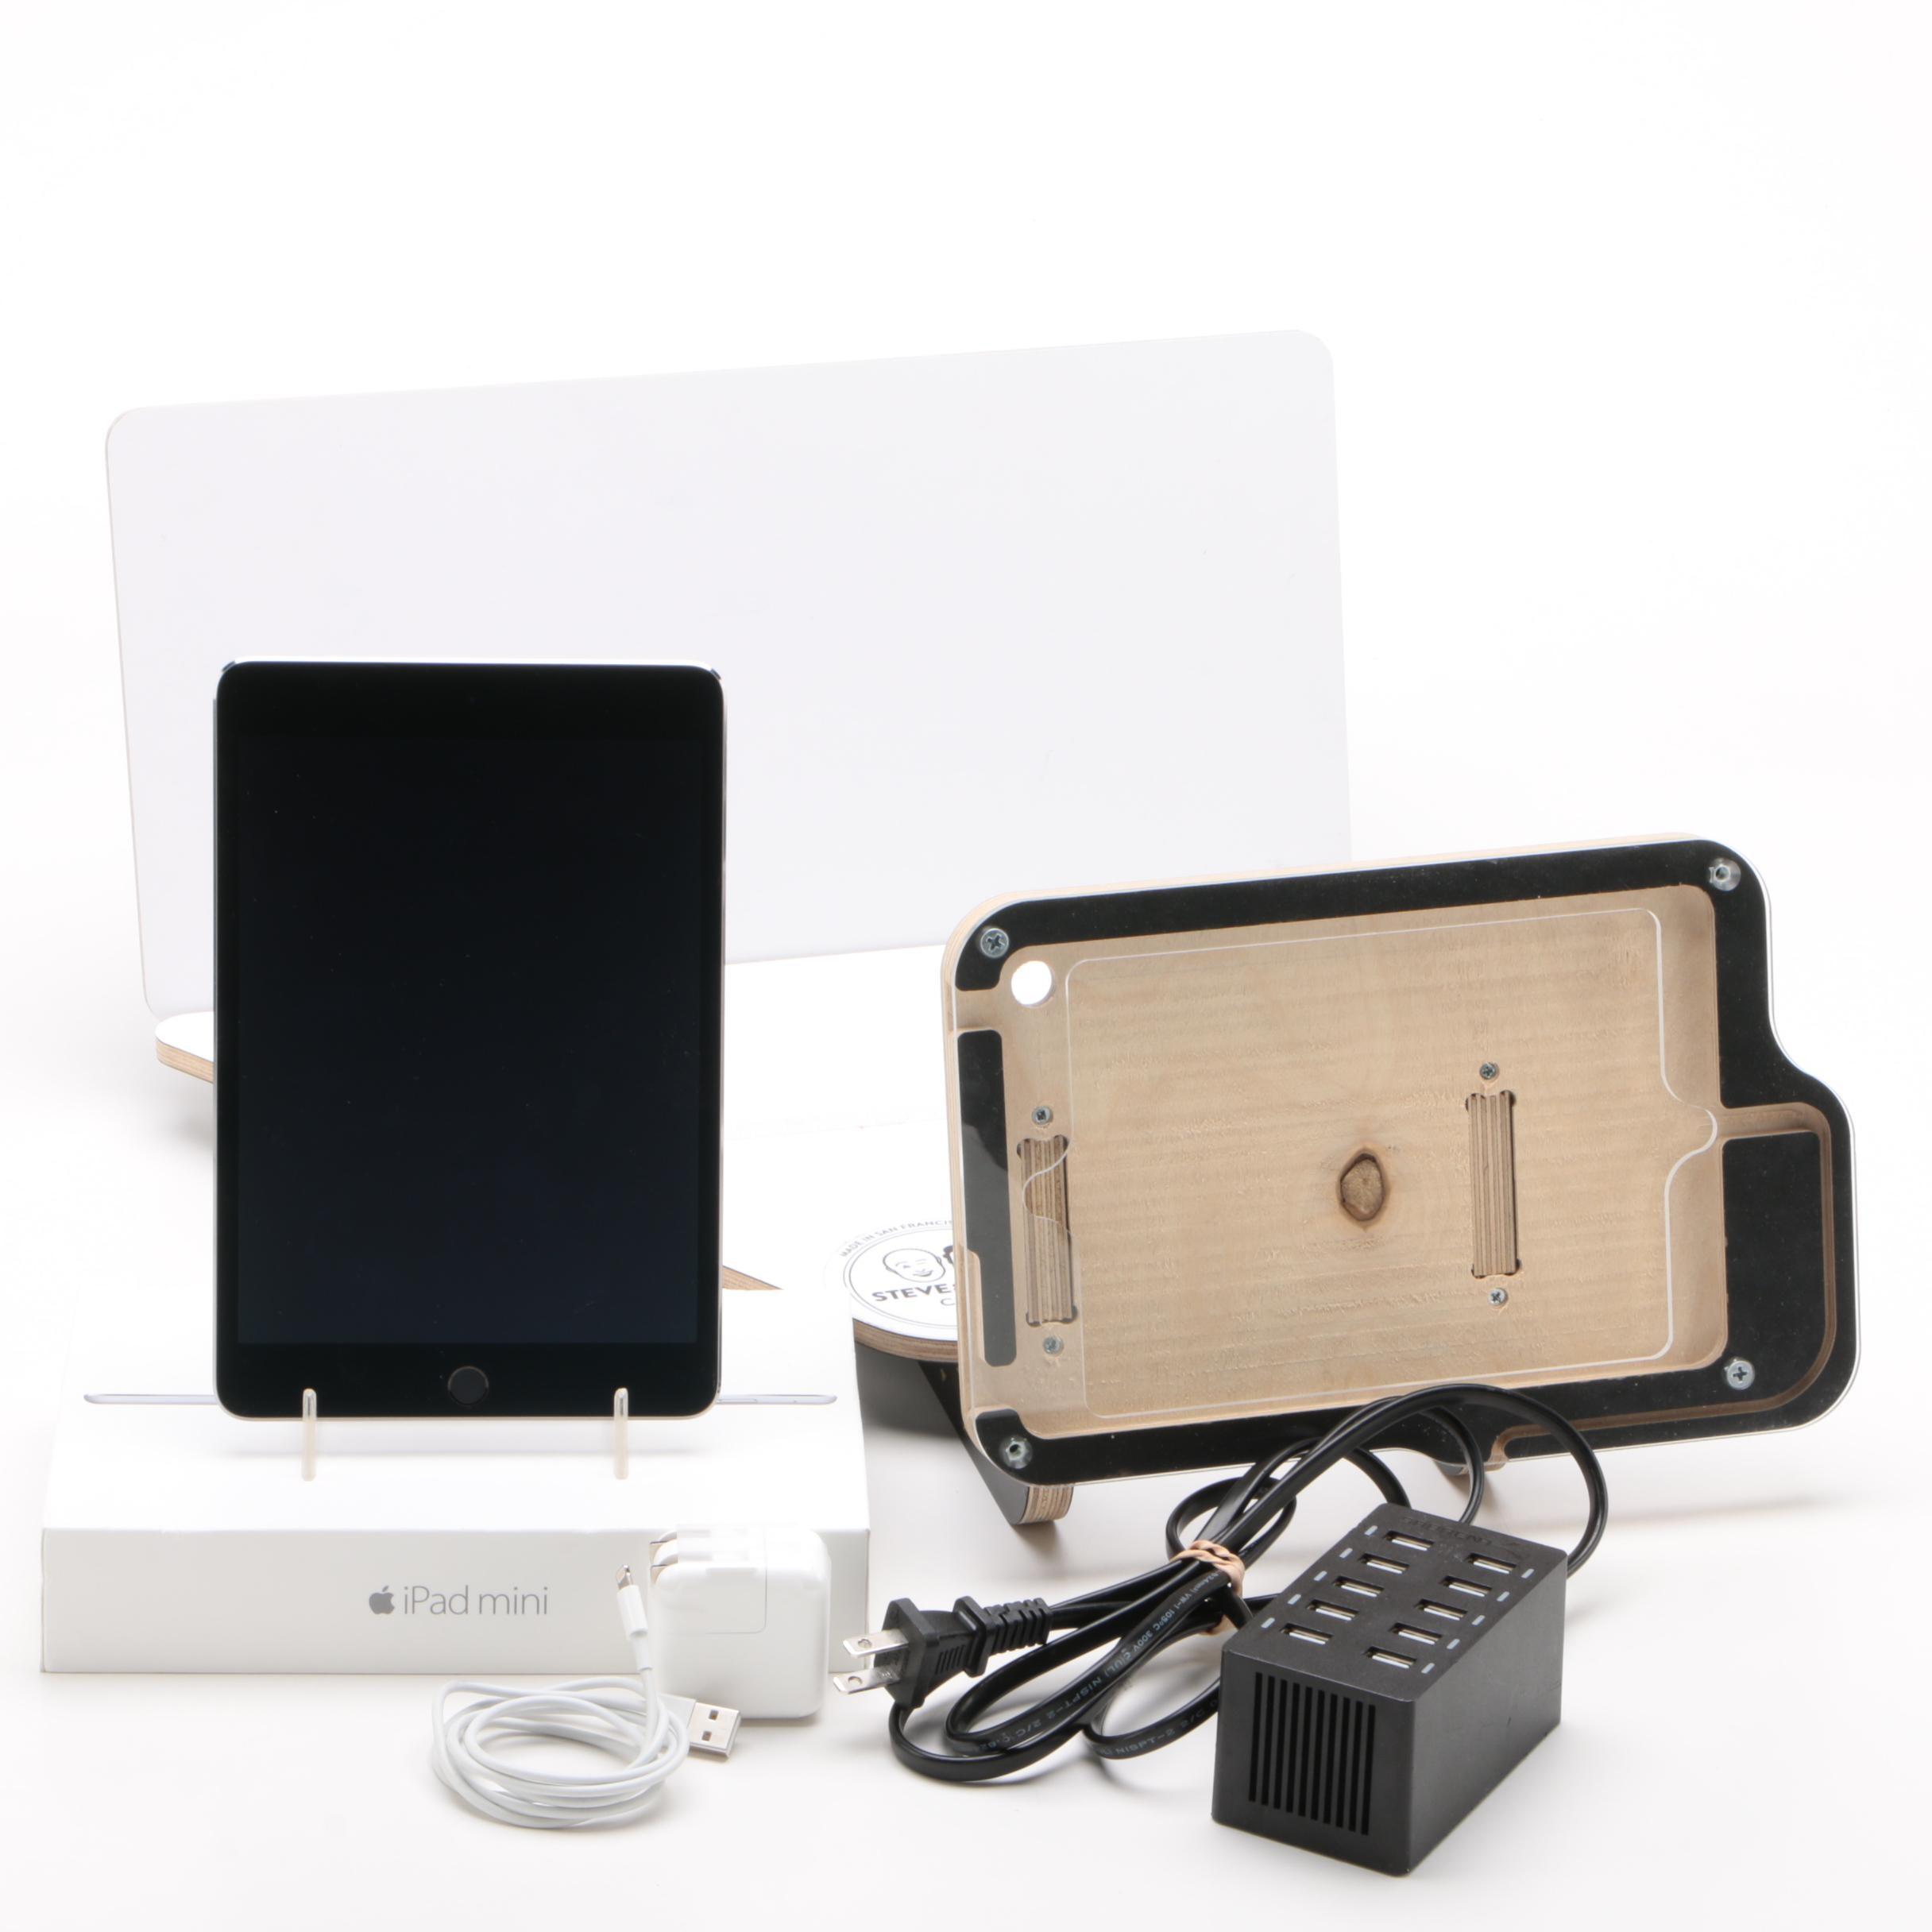 128GB Apple iPad Mini 4 with Animation Station